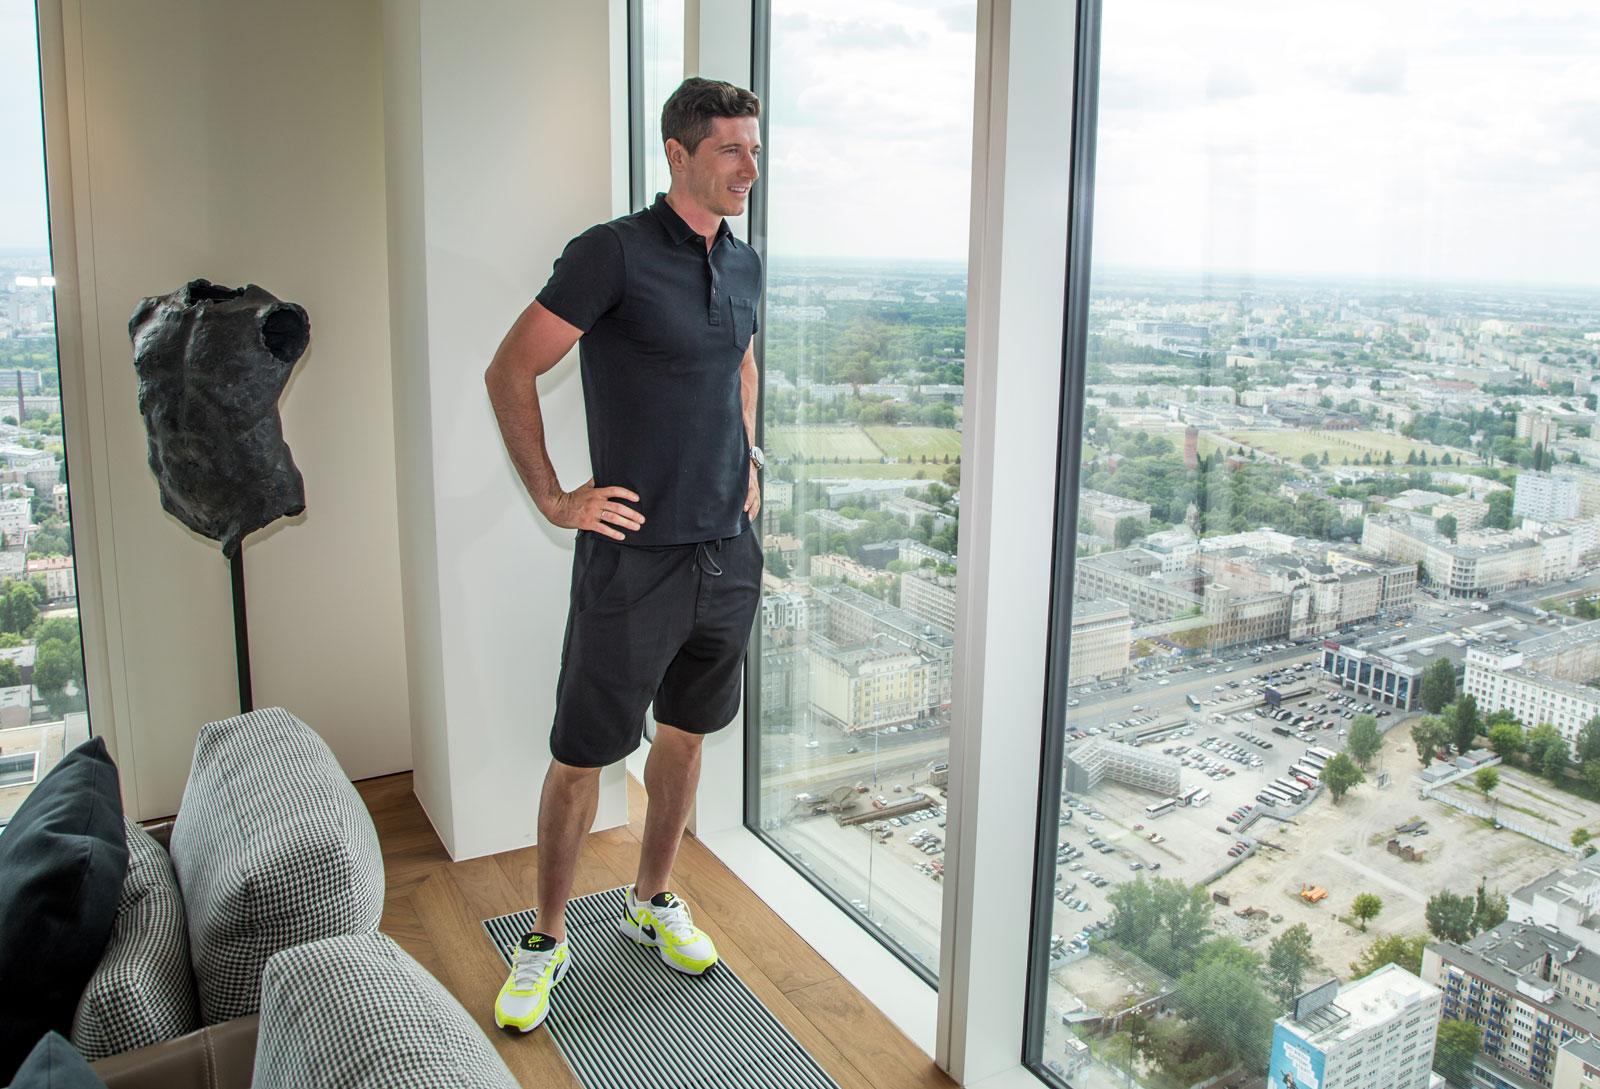 Robert Lewandowski admiring the view at Zlota 44